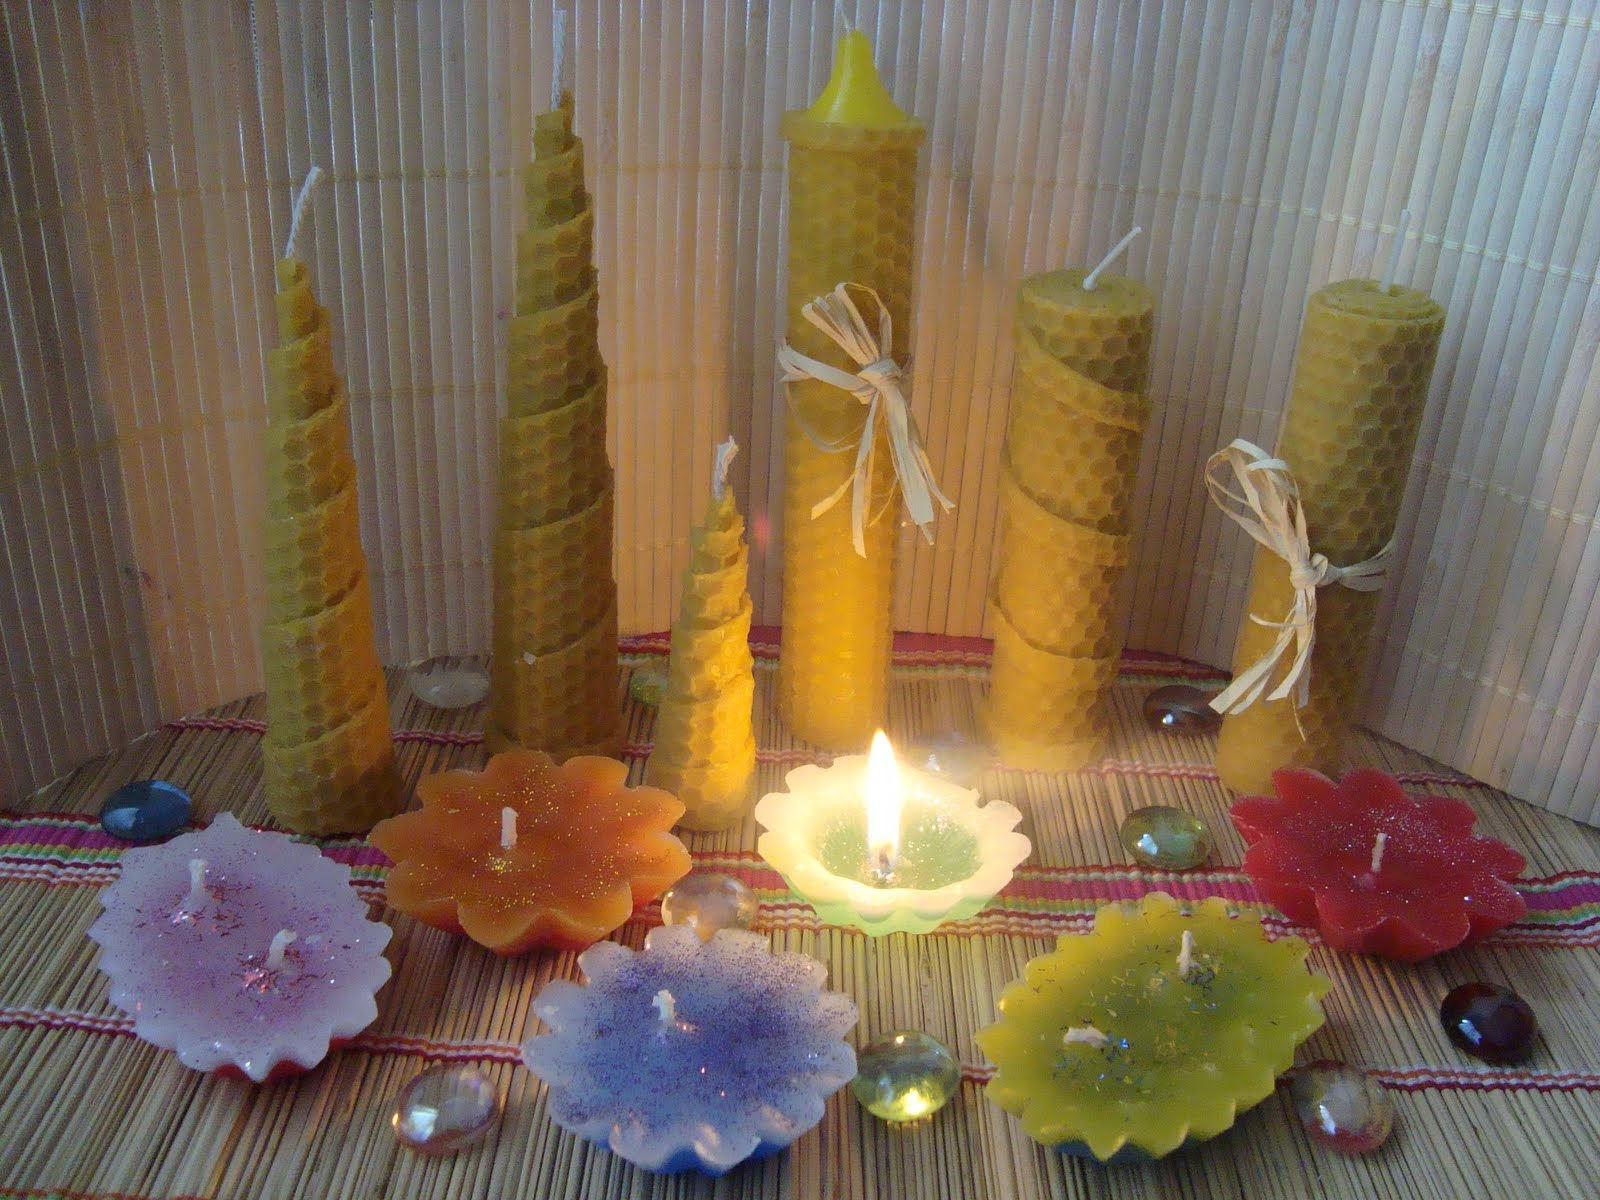 Nanymar artesania con magia - Velas de miel ...